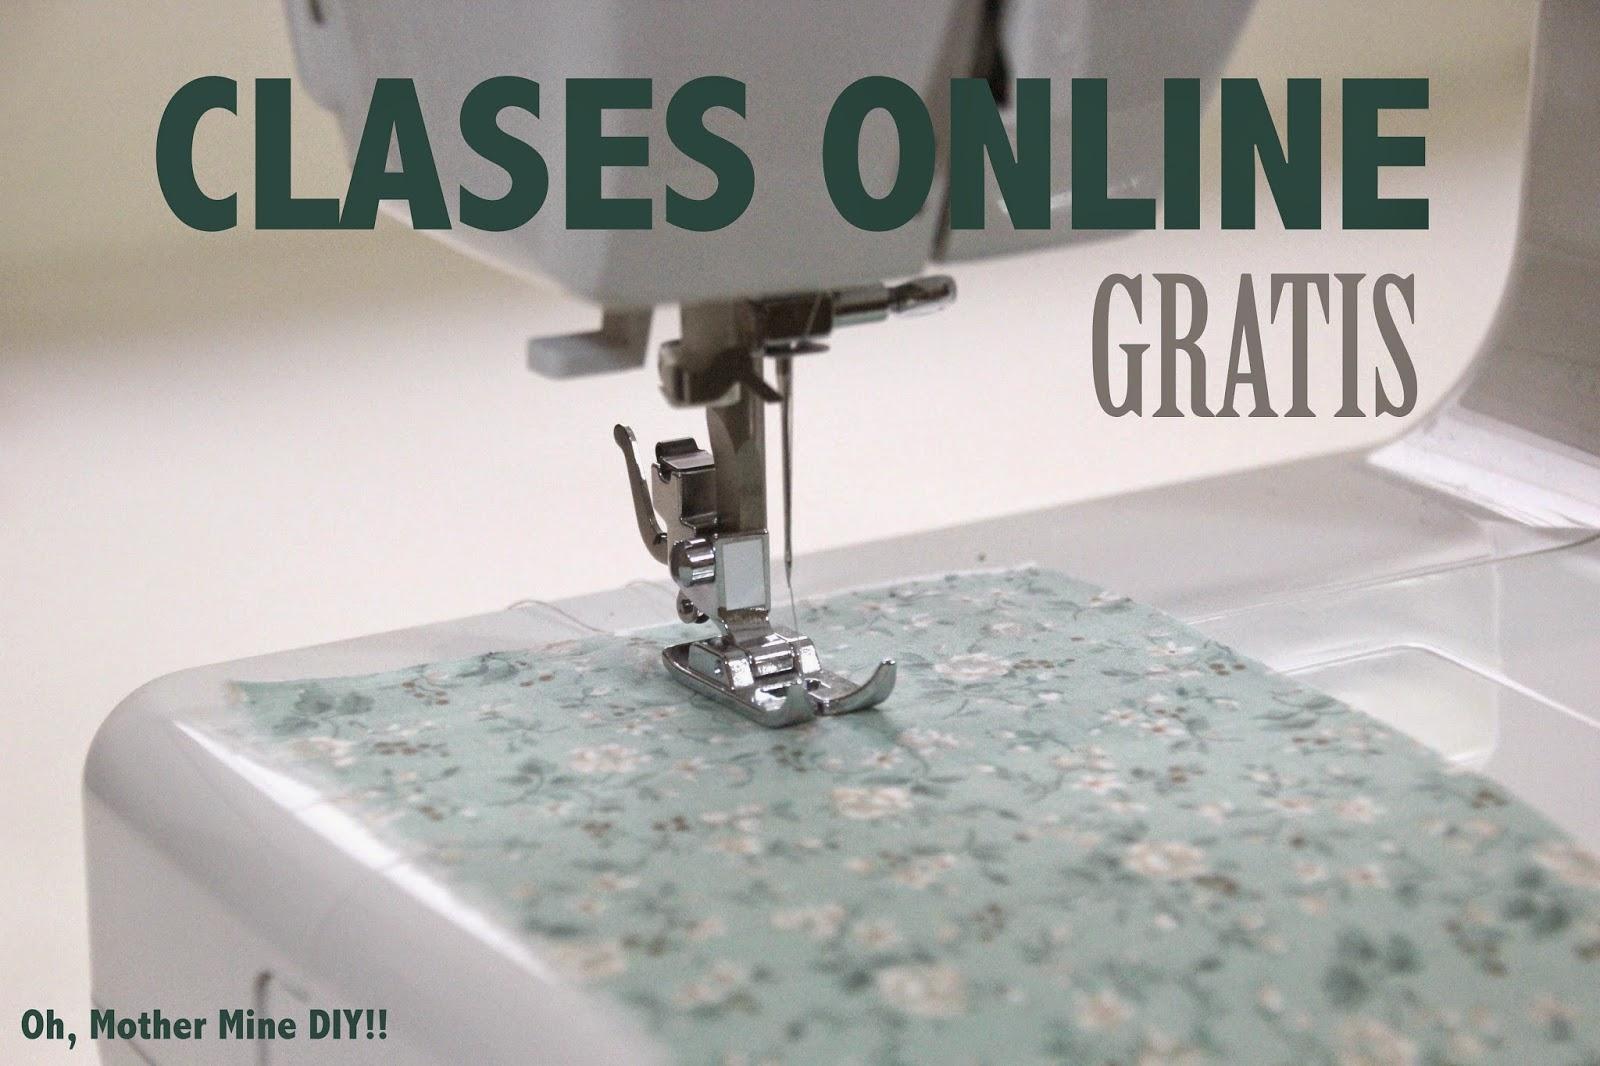 Clases de costura online gratis d oh mother mine diy for Curso de interiorismo online gratis